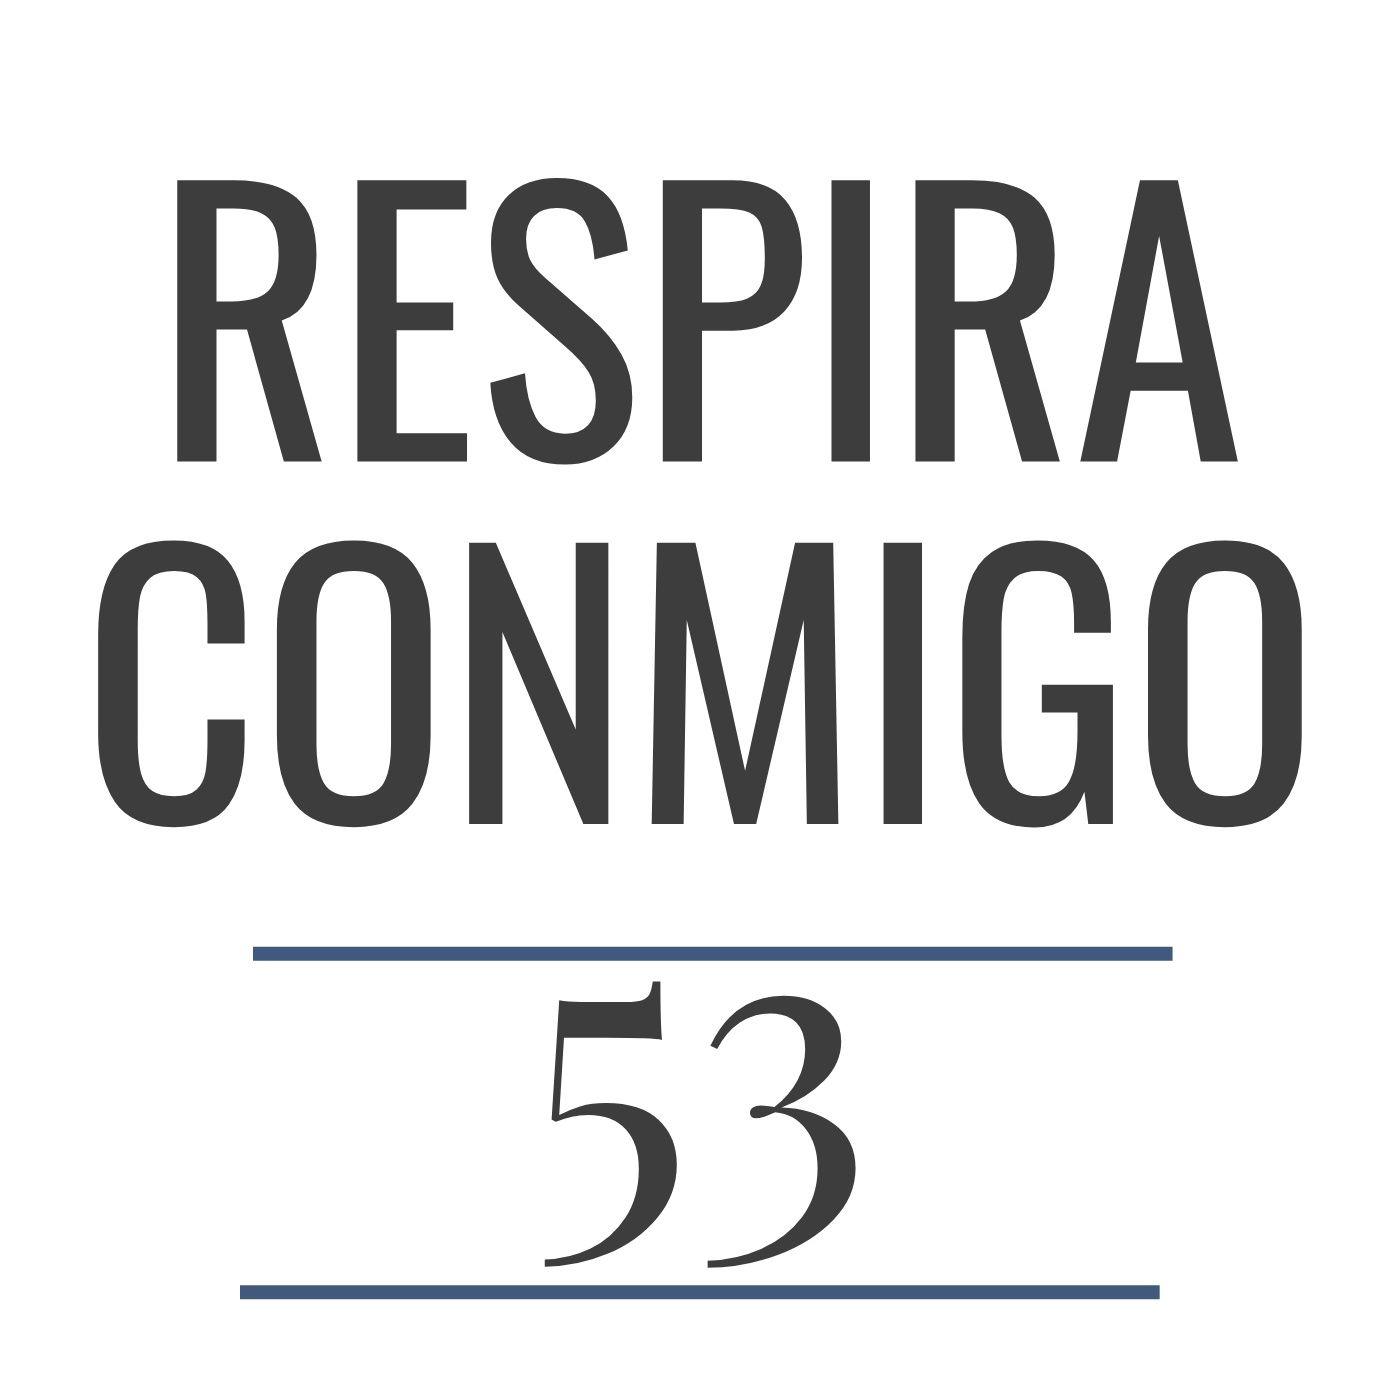 53 - La séptima costilla